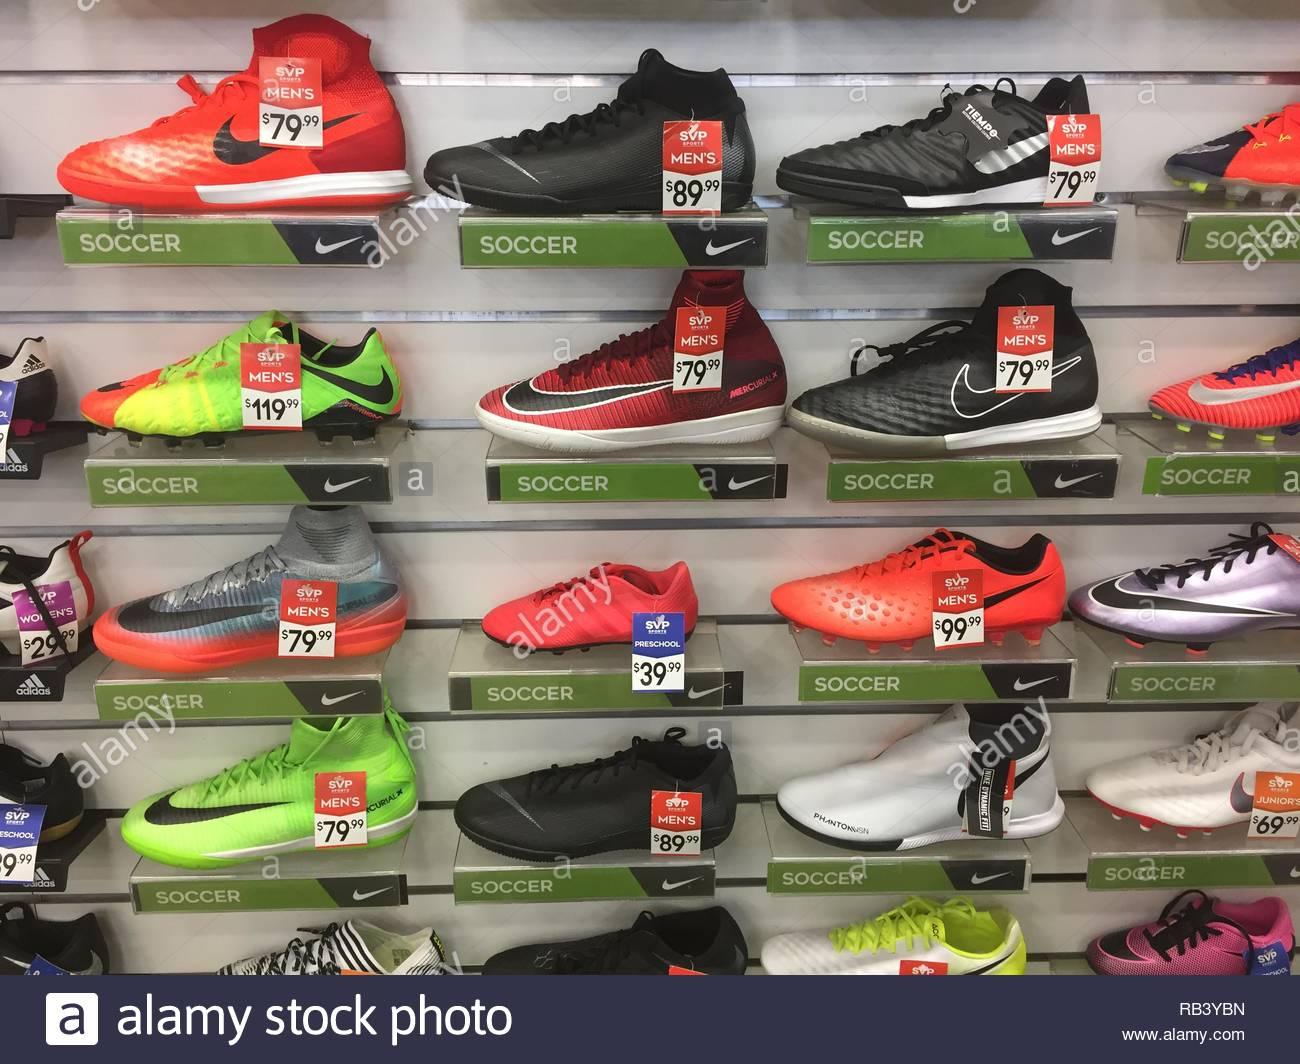 Adidas Sports Shoes Imágenes De Stock   Adidas Sports Shoes Fotos De ... 98d691c2d28d1